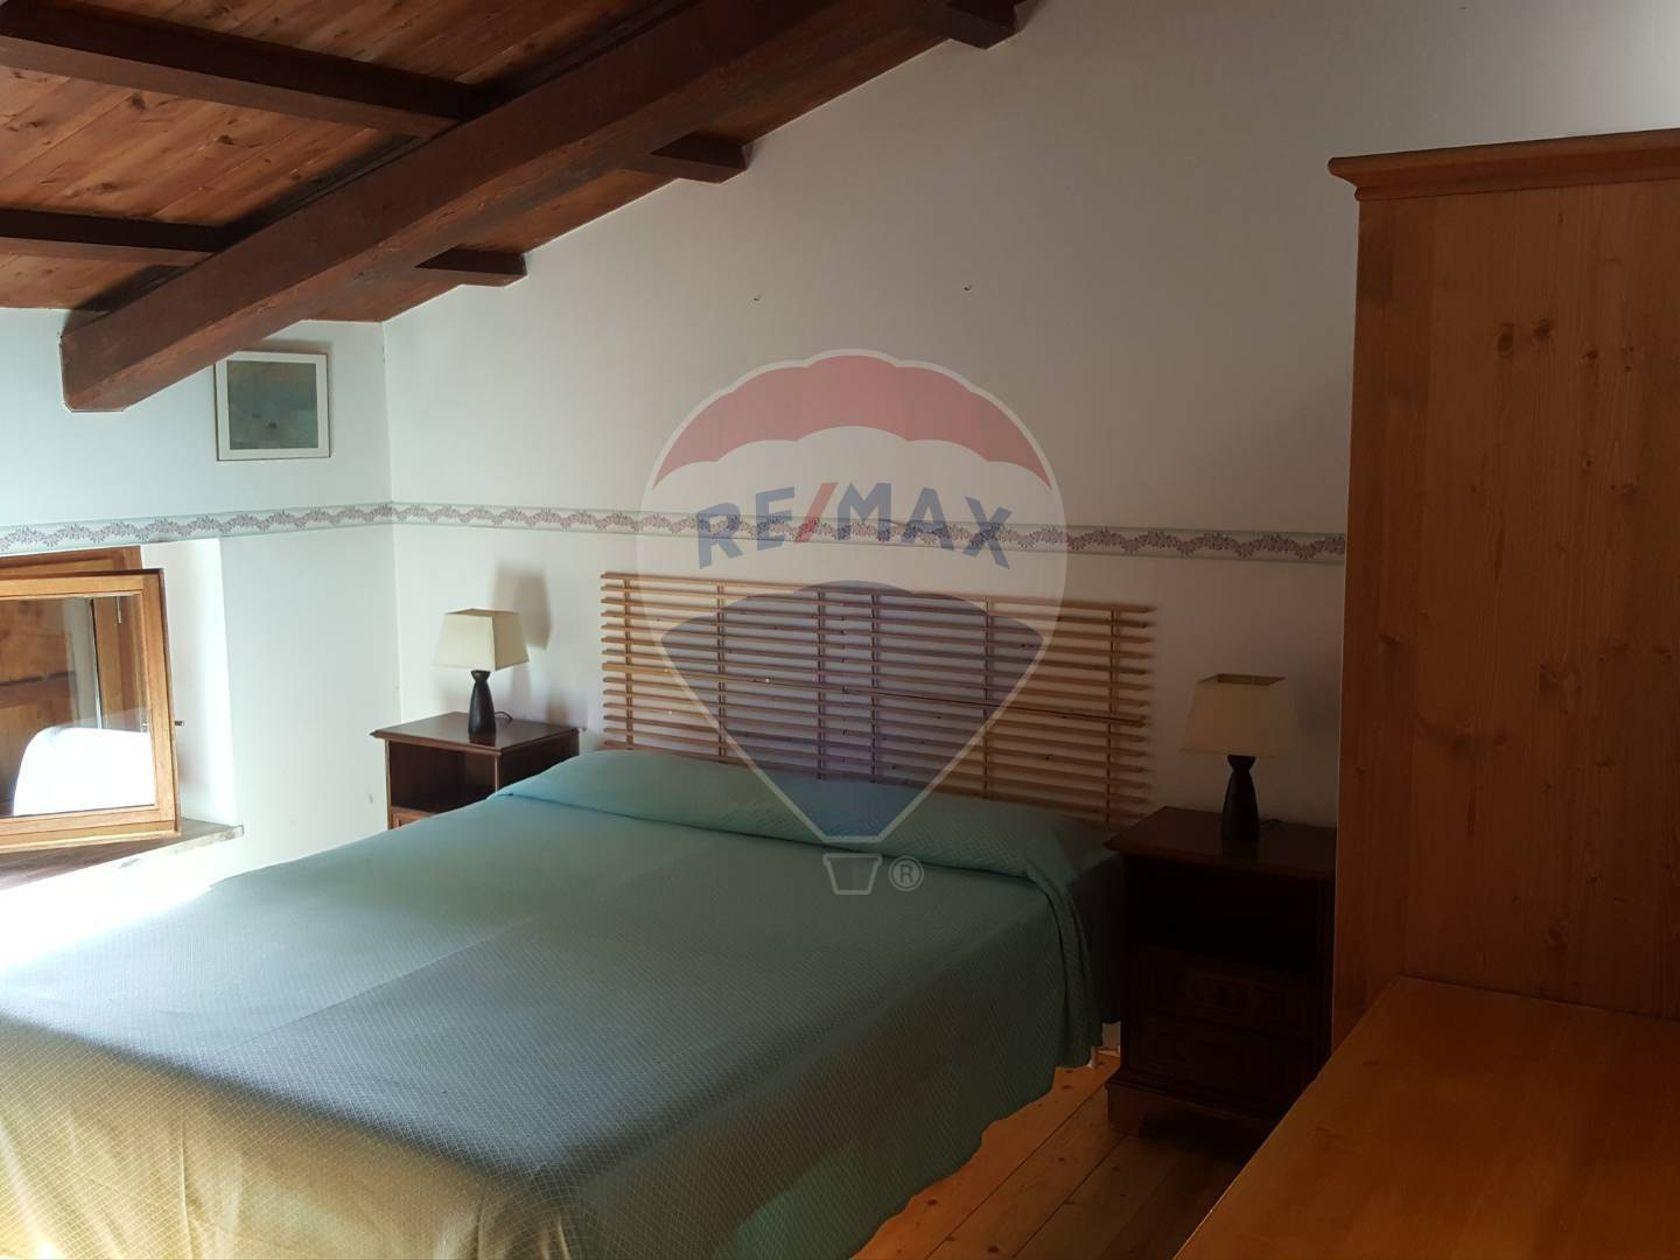 Albergo/Hotel Nepi, VT Vendita - Foto 11